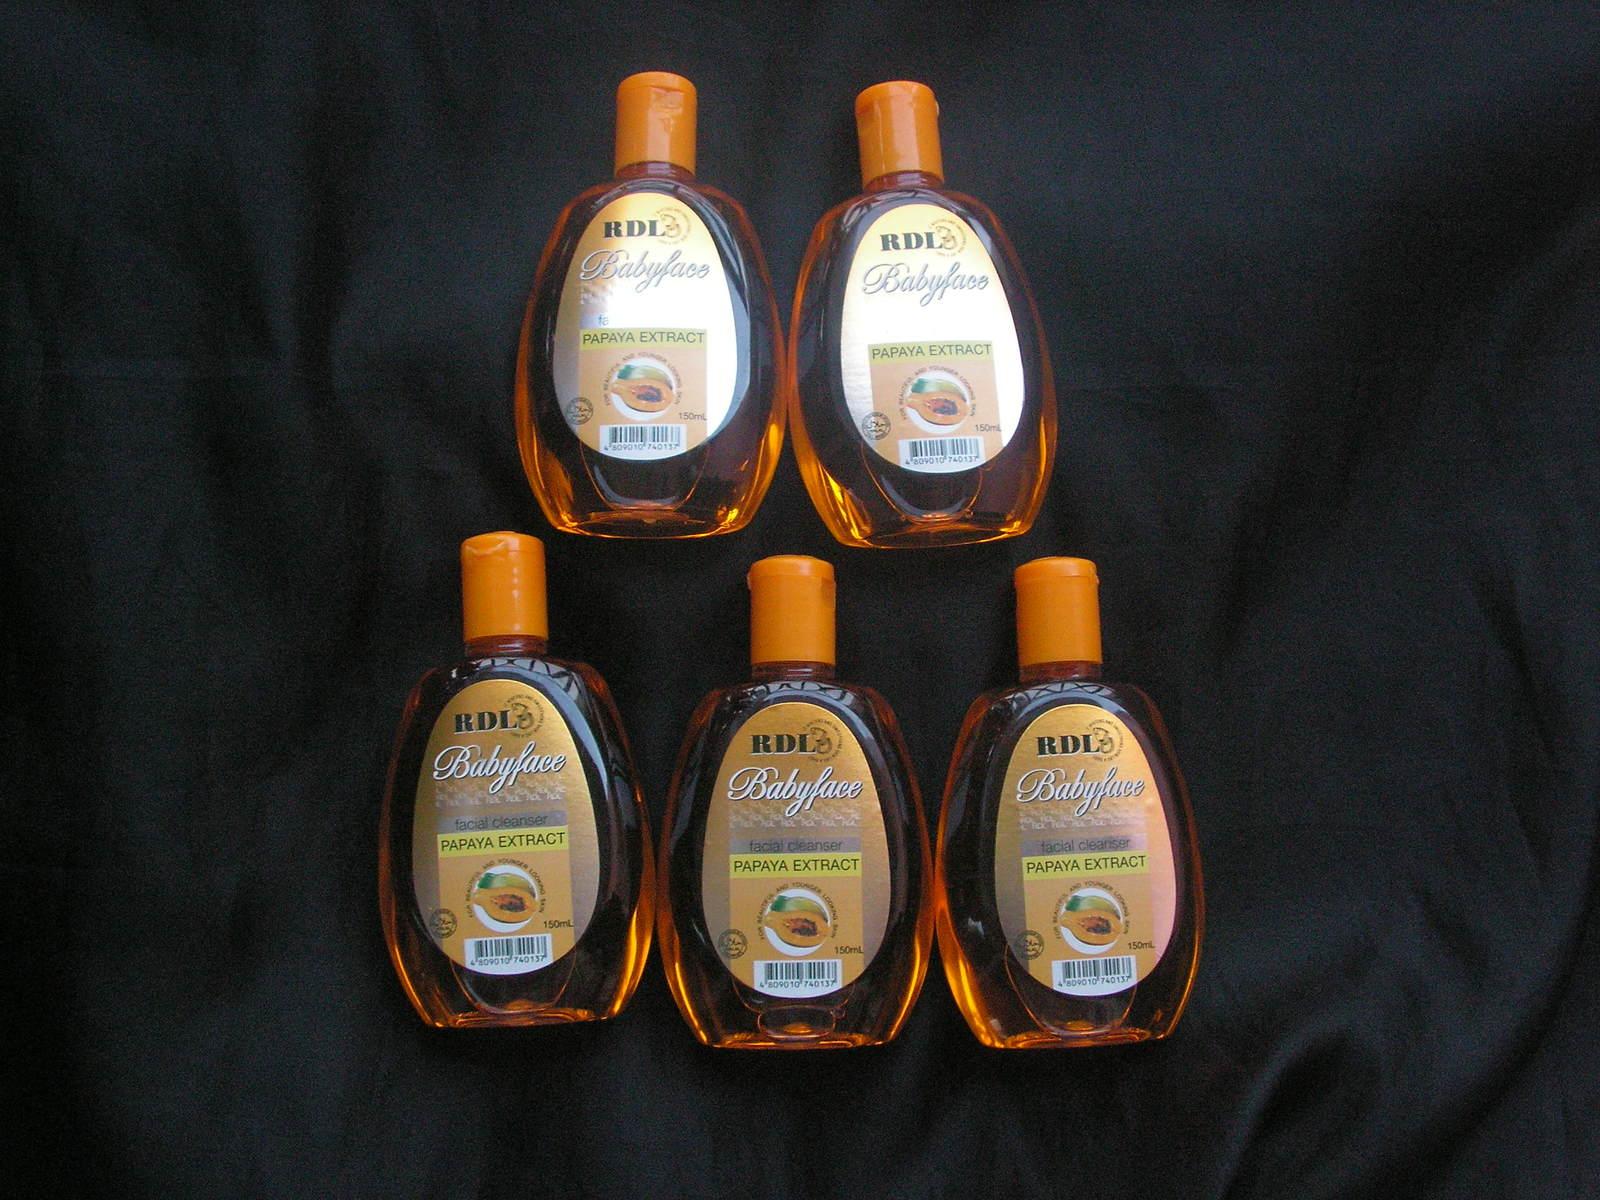 Toner Rdl Baby Face Alkohol 2 Original 3 Botol Daftar Update Harga Pharmaceutical 1 Source V Natural Temulawak Whitening